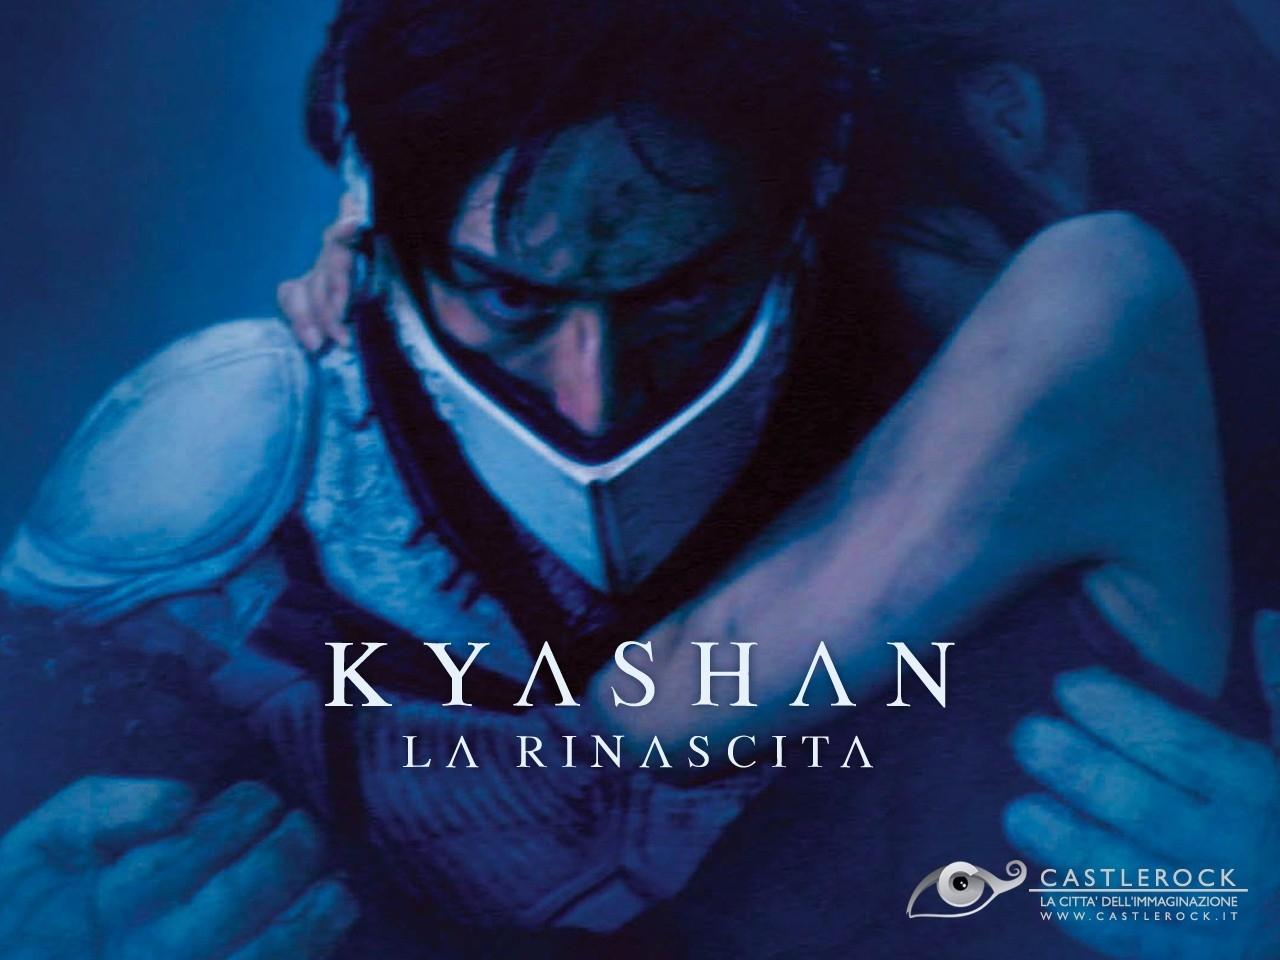 Wallpaper del film Kyashan - la rinascita con il protagonista